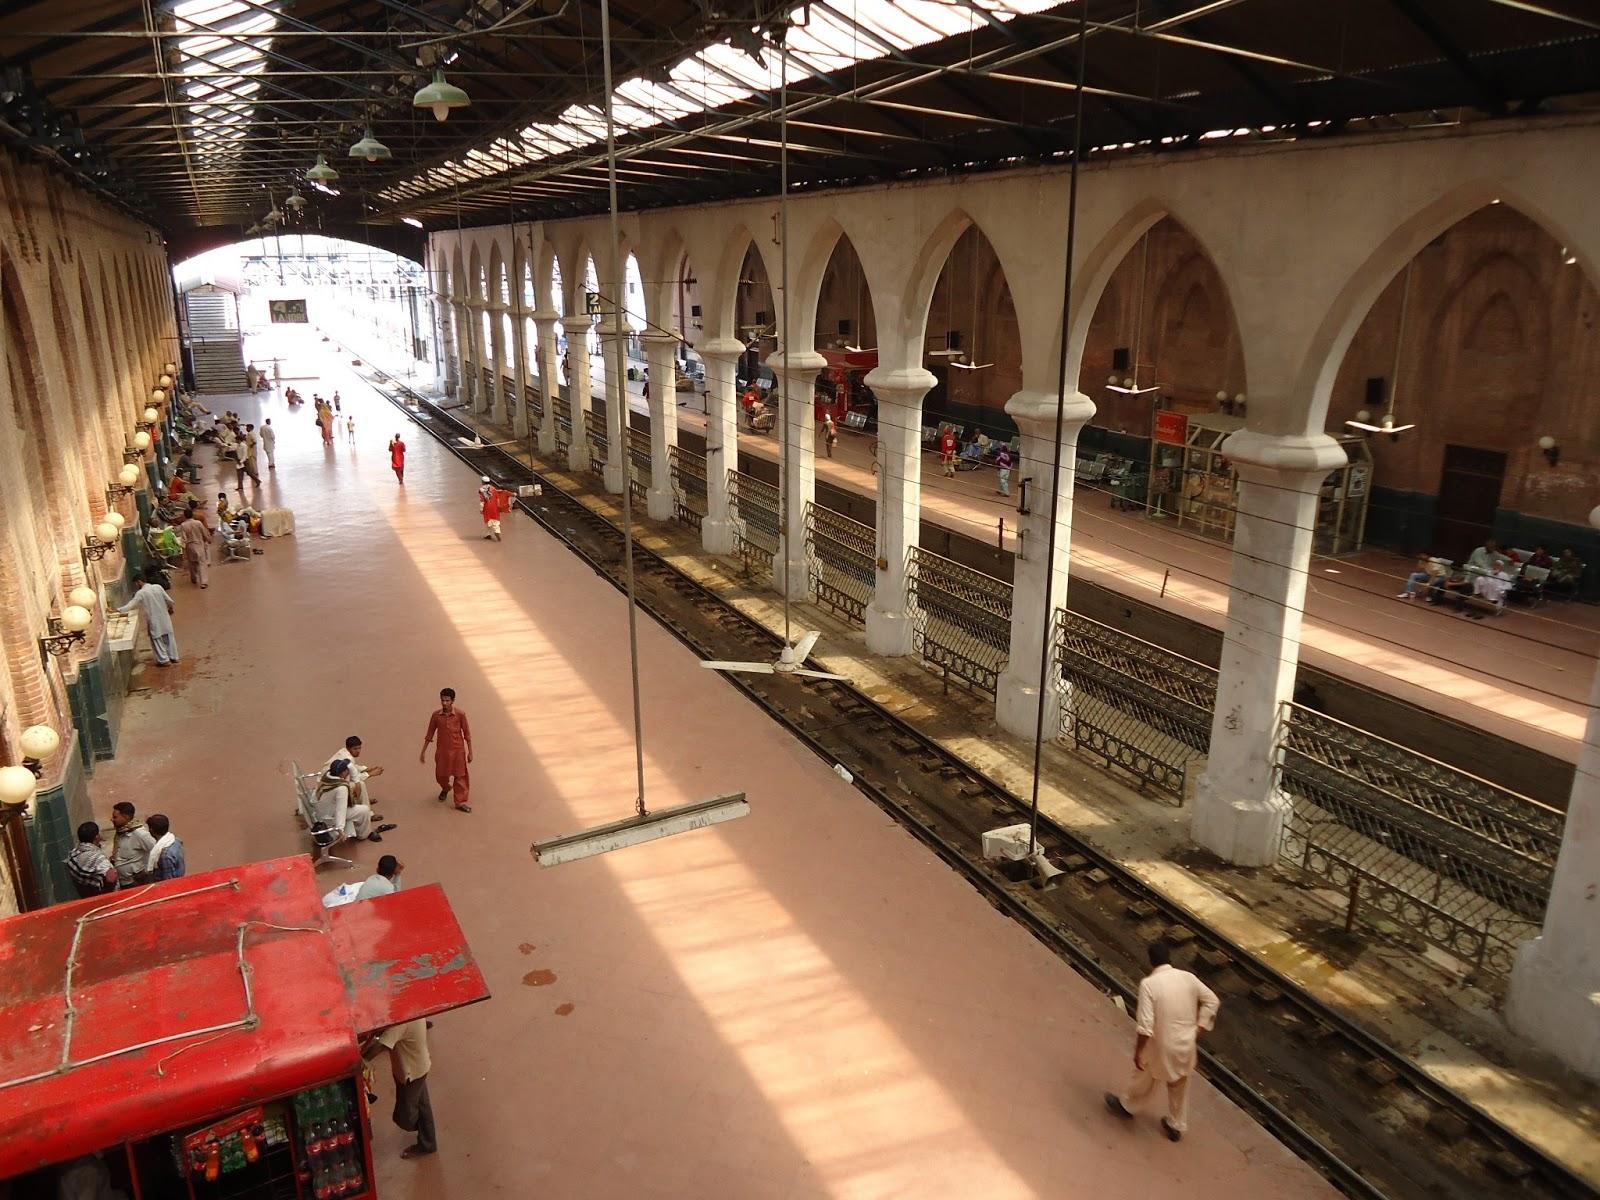 Images PK Lahore Railway Station